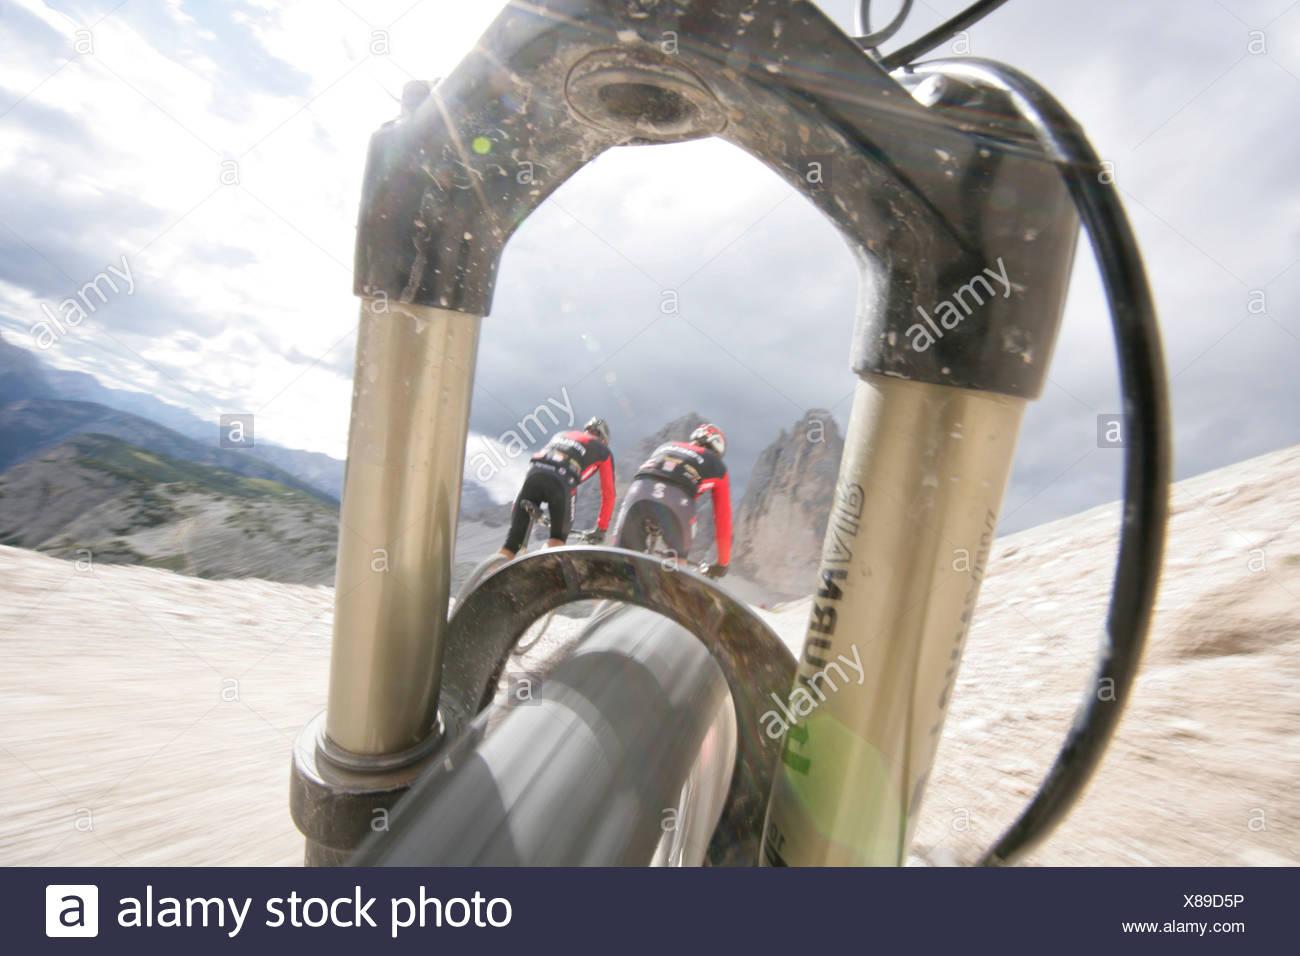 Personen-Mountainbiken in der Nähe von Tre Cime di Lavaredo, Veneto, Italien Stockfoto